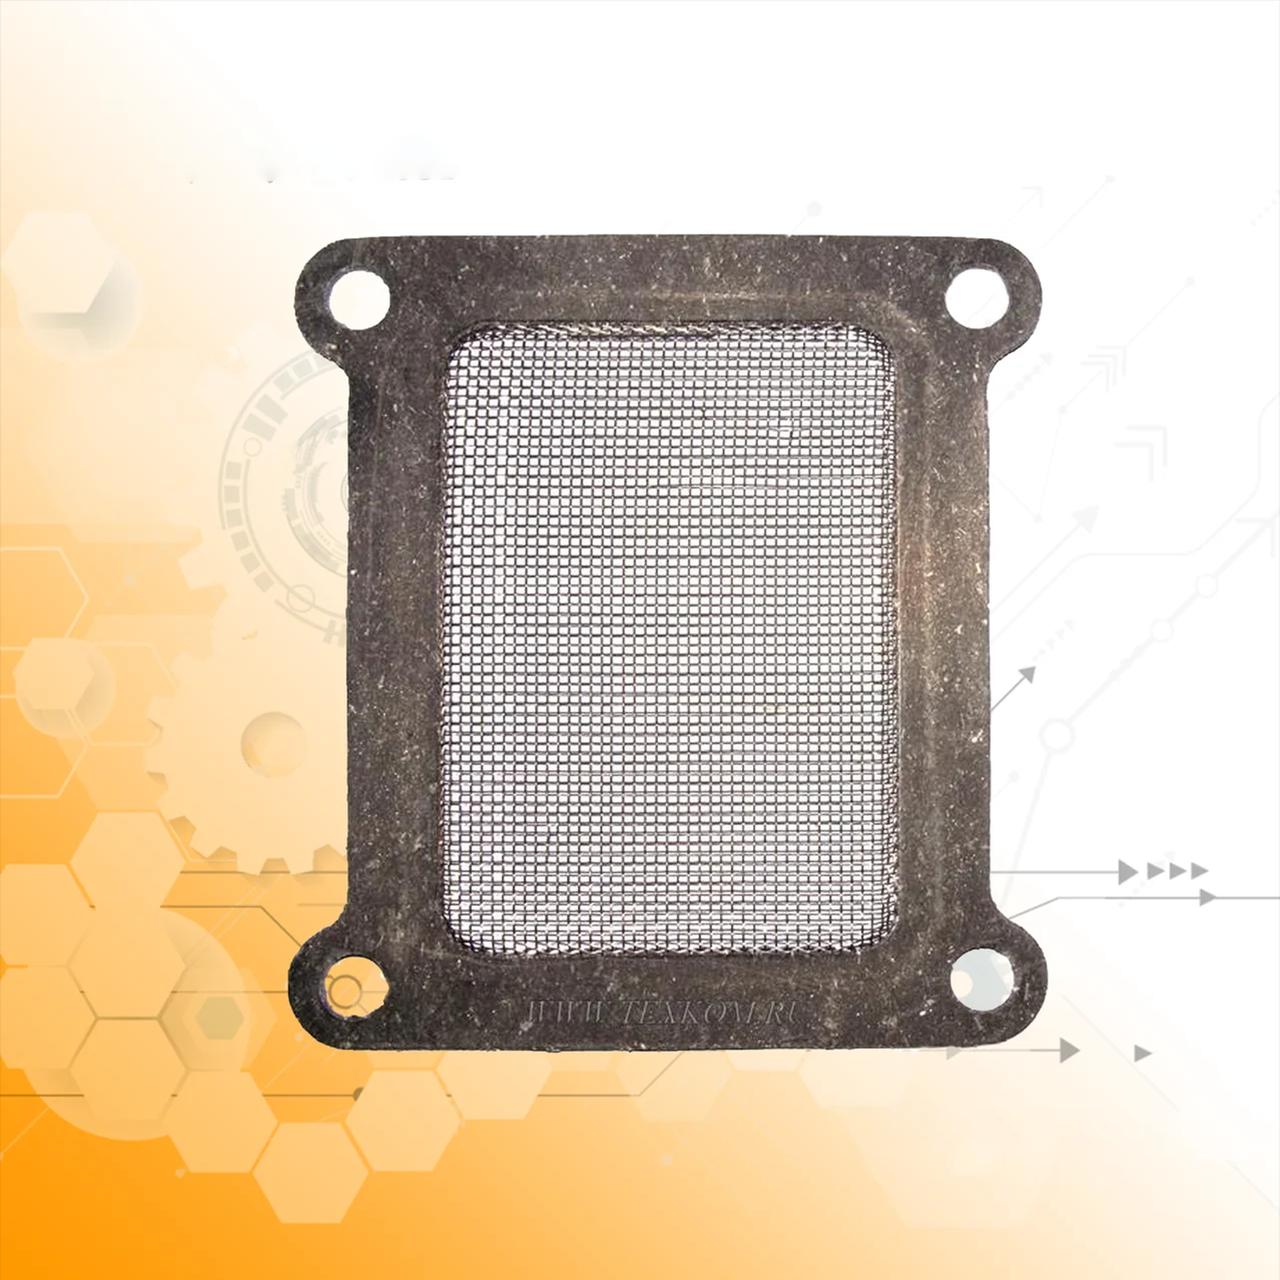 Прокладка компрессора ЯМЗ (сетка) 236-1002283